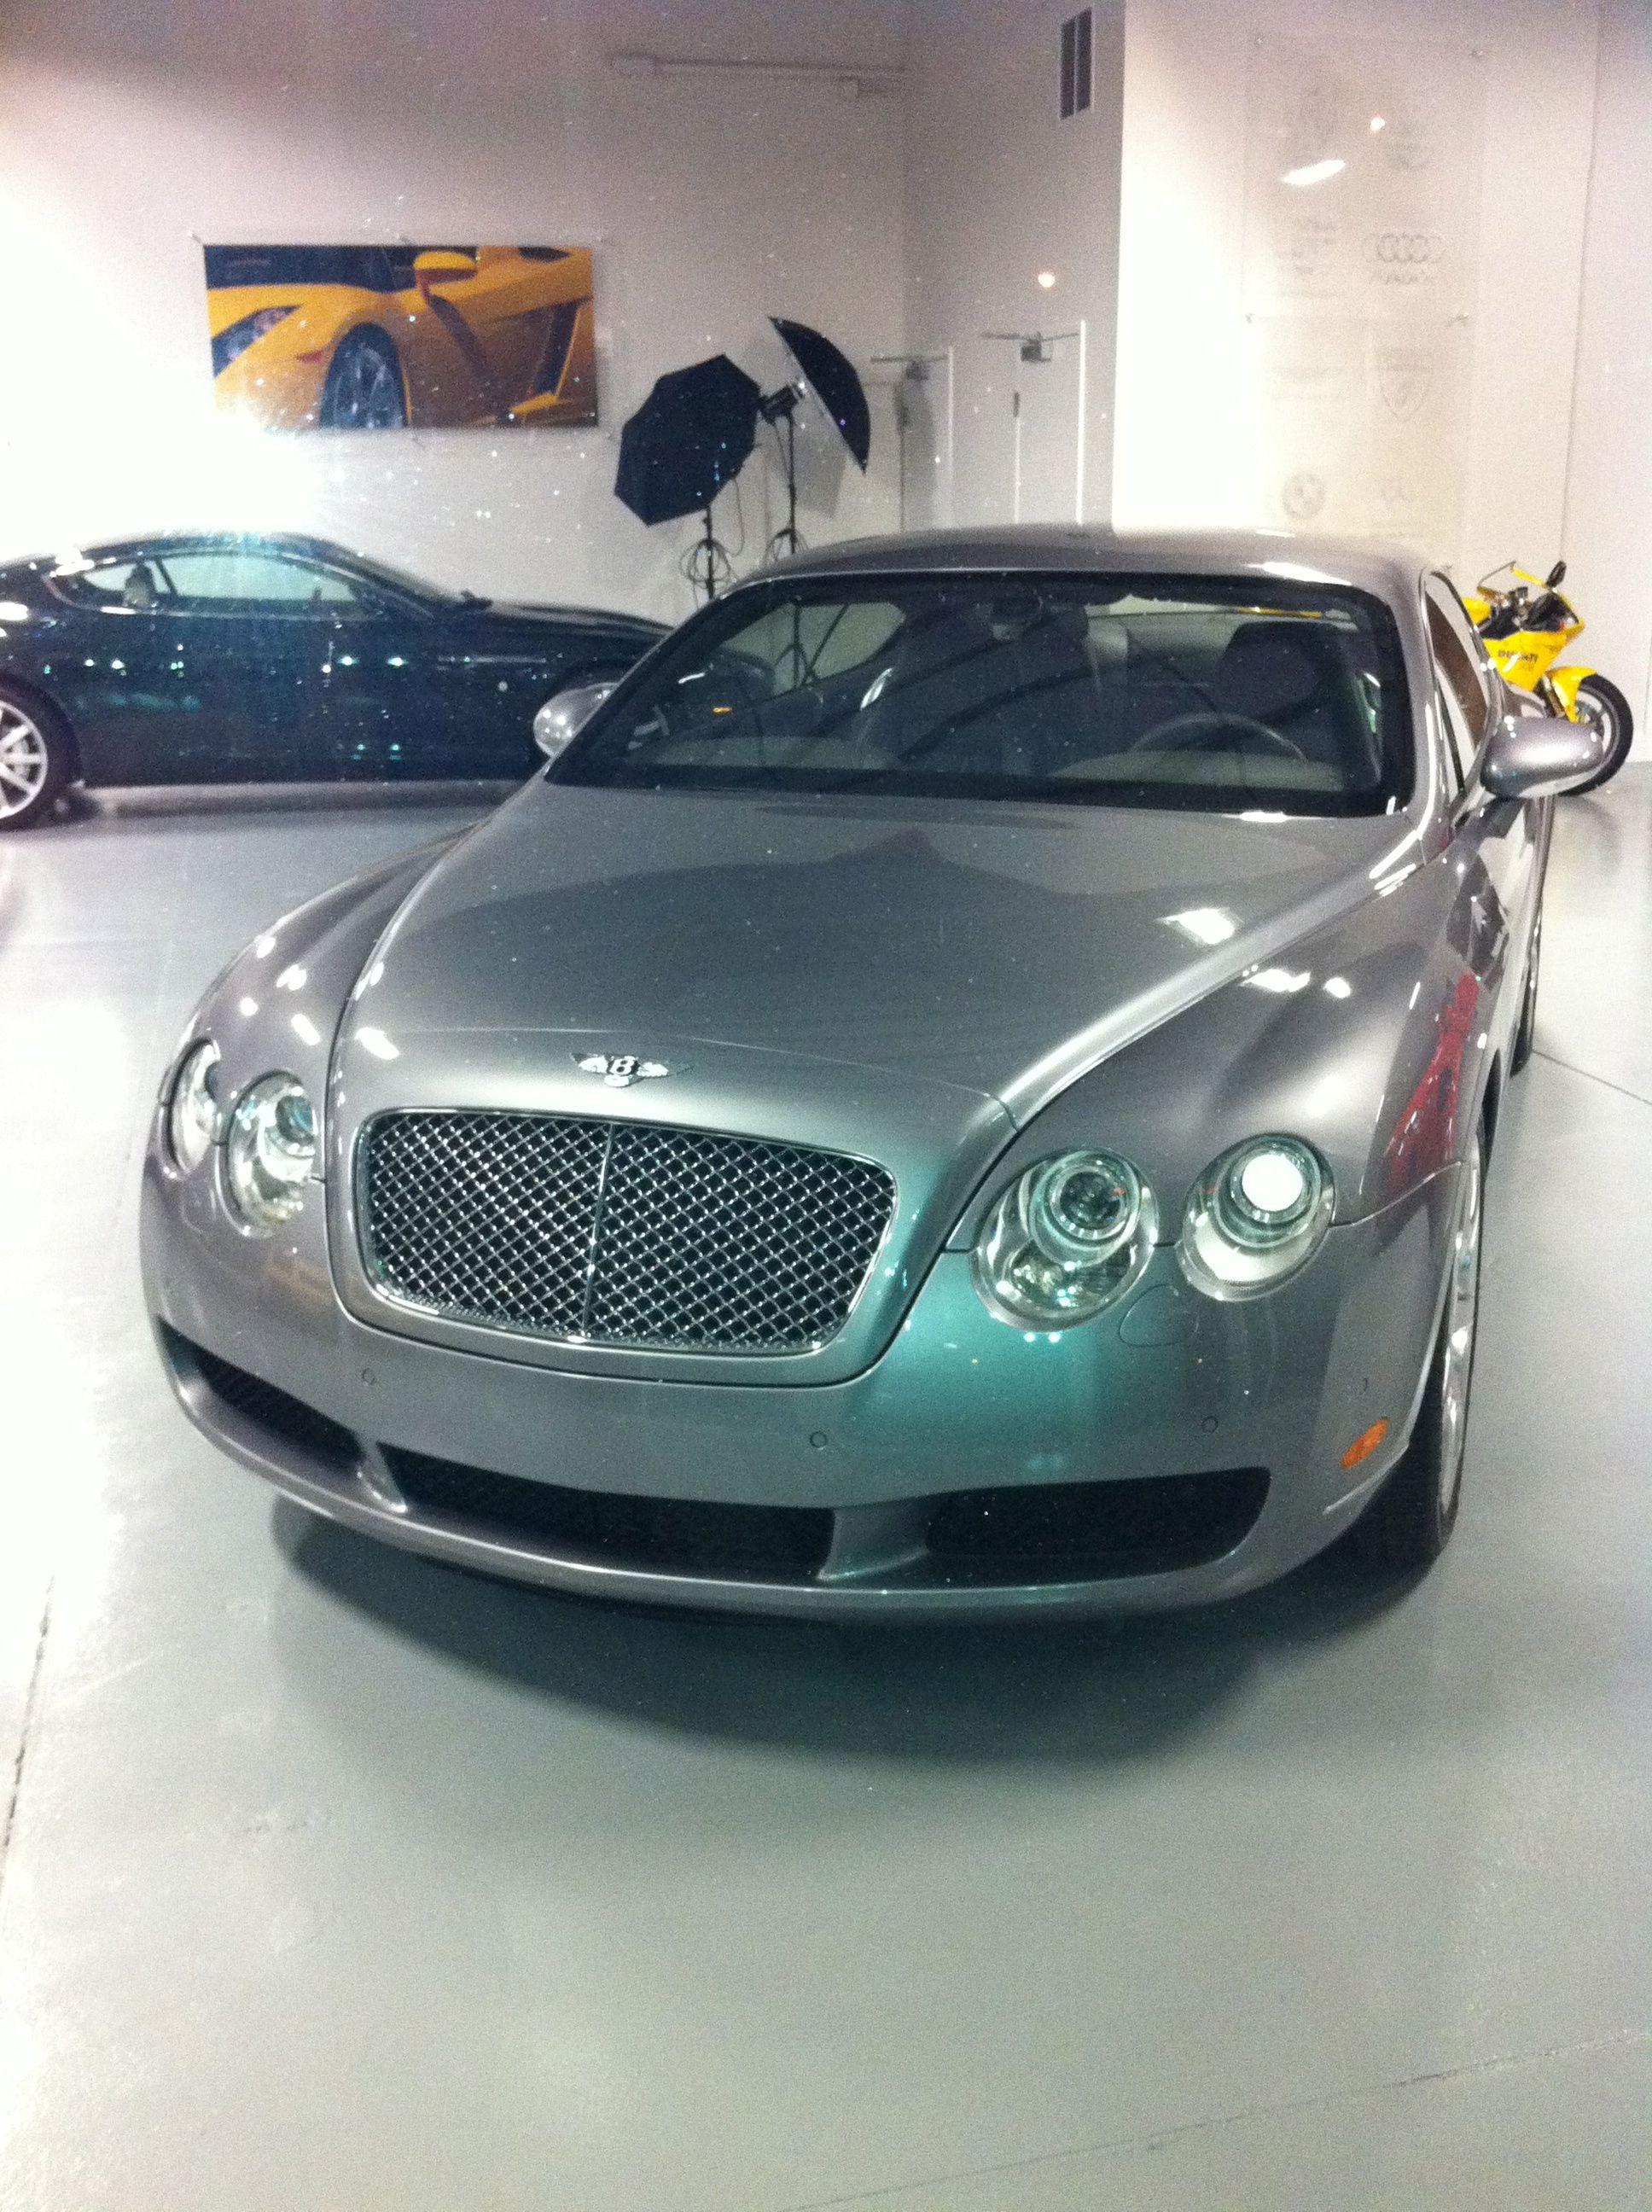 en miami exotic huracan redirect results luxury rentals rental car bentley prestige lamborghini philadelphia search b